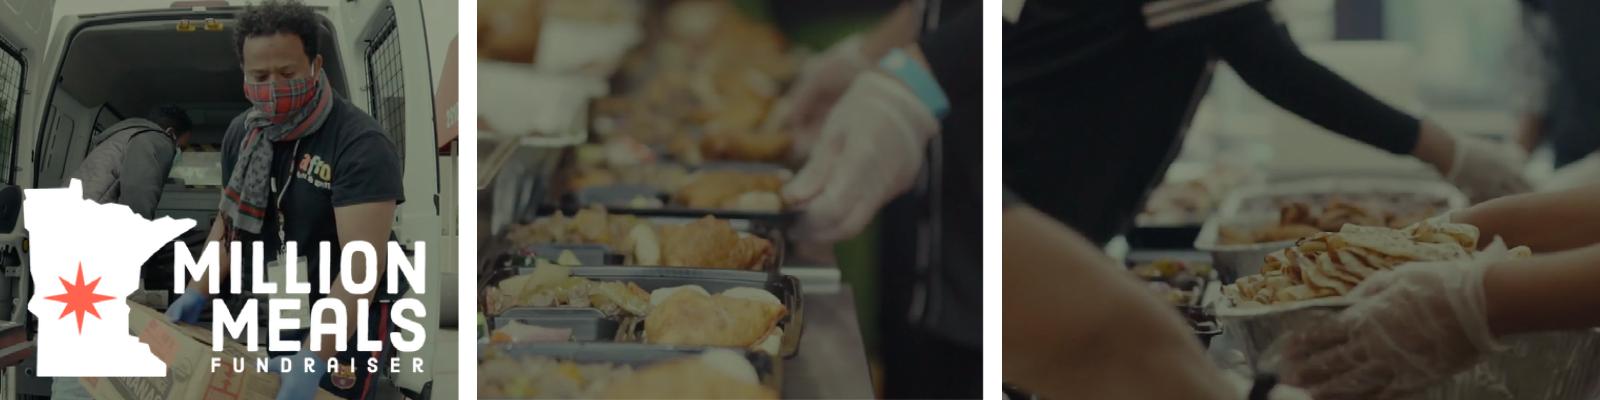 Feeding Community Million Meals Fundraiser